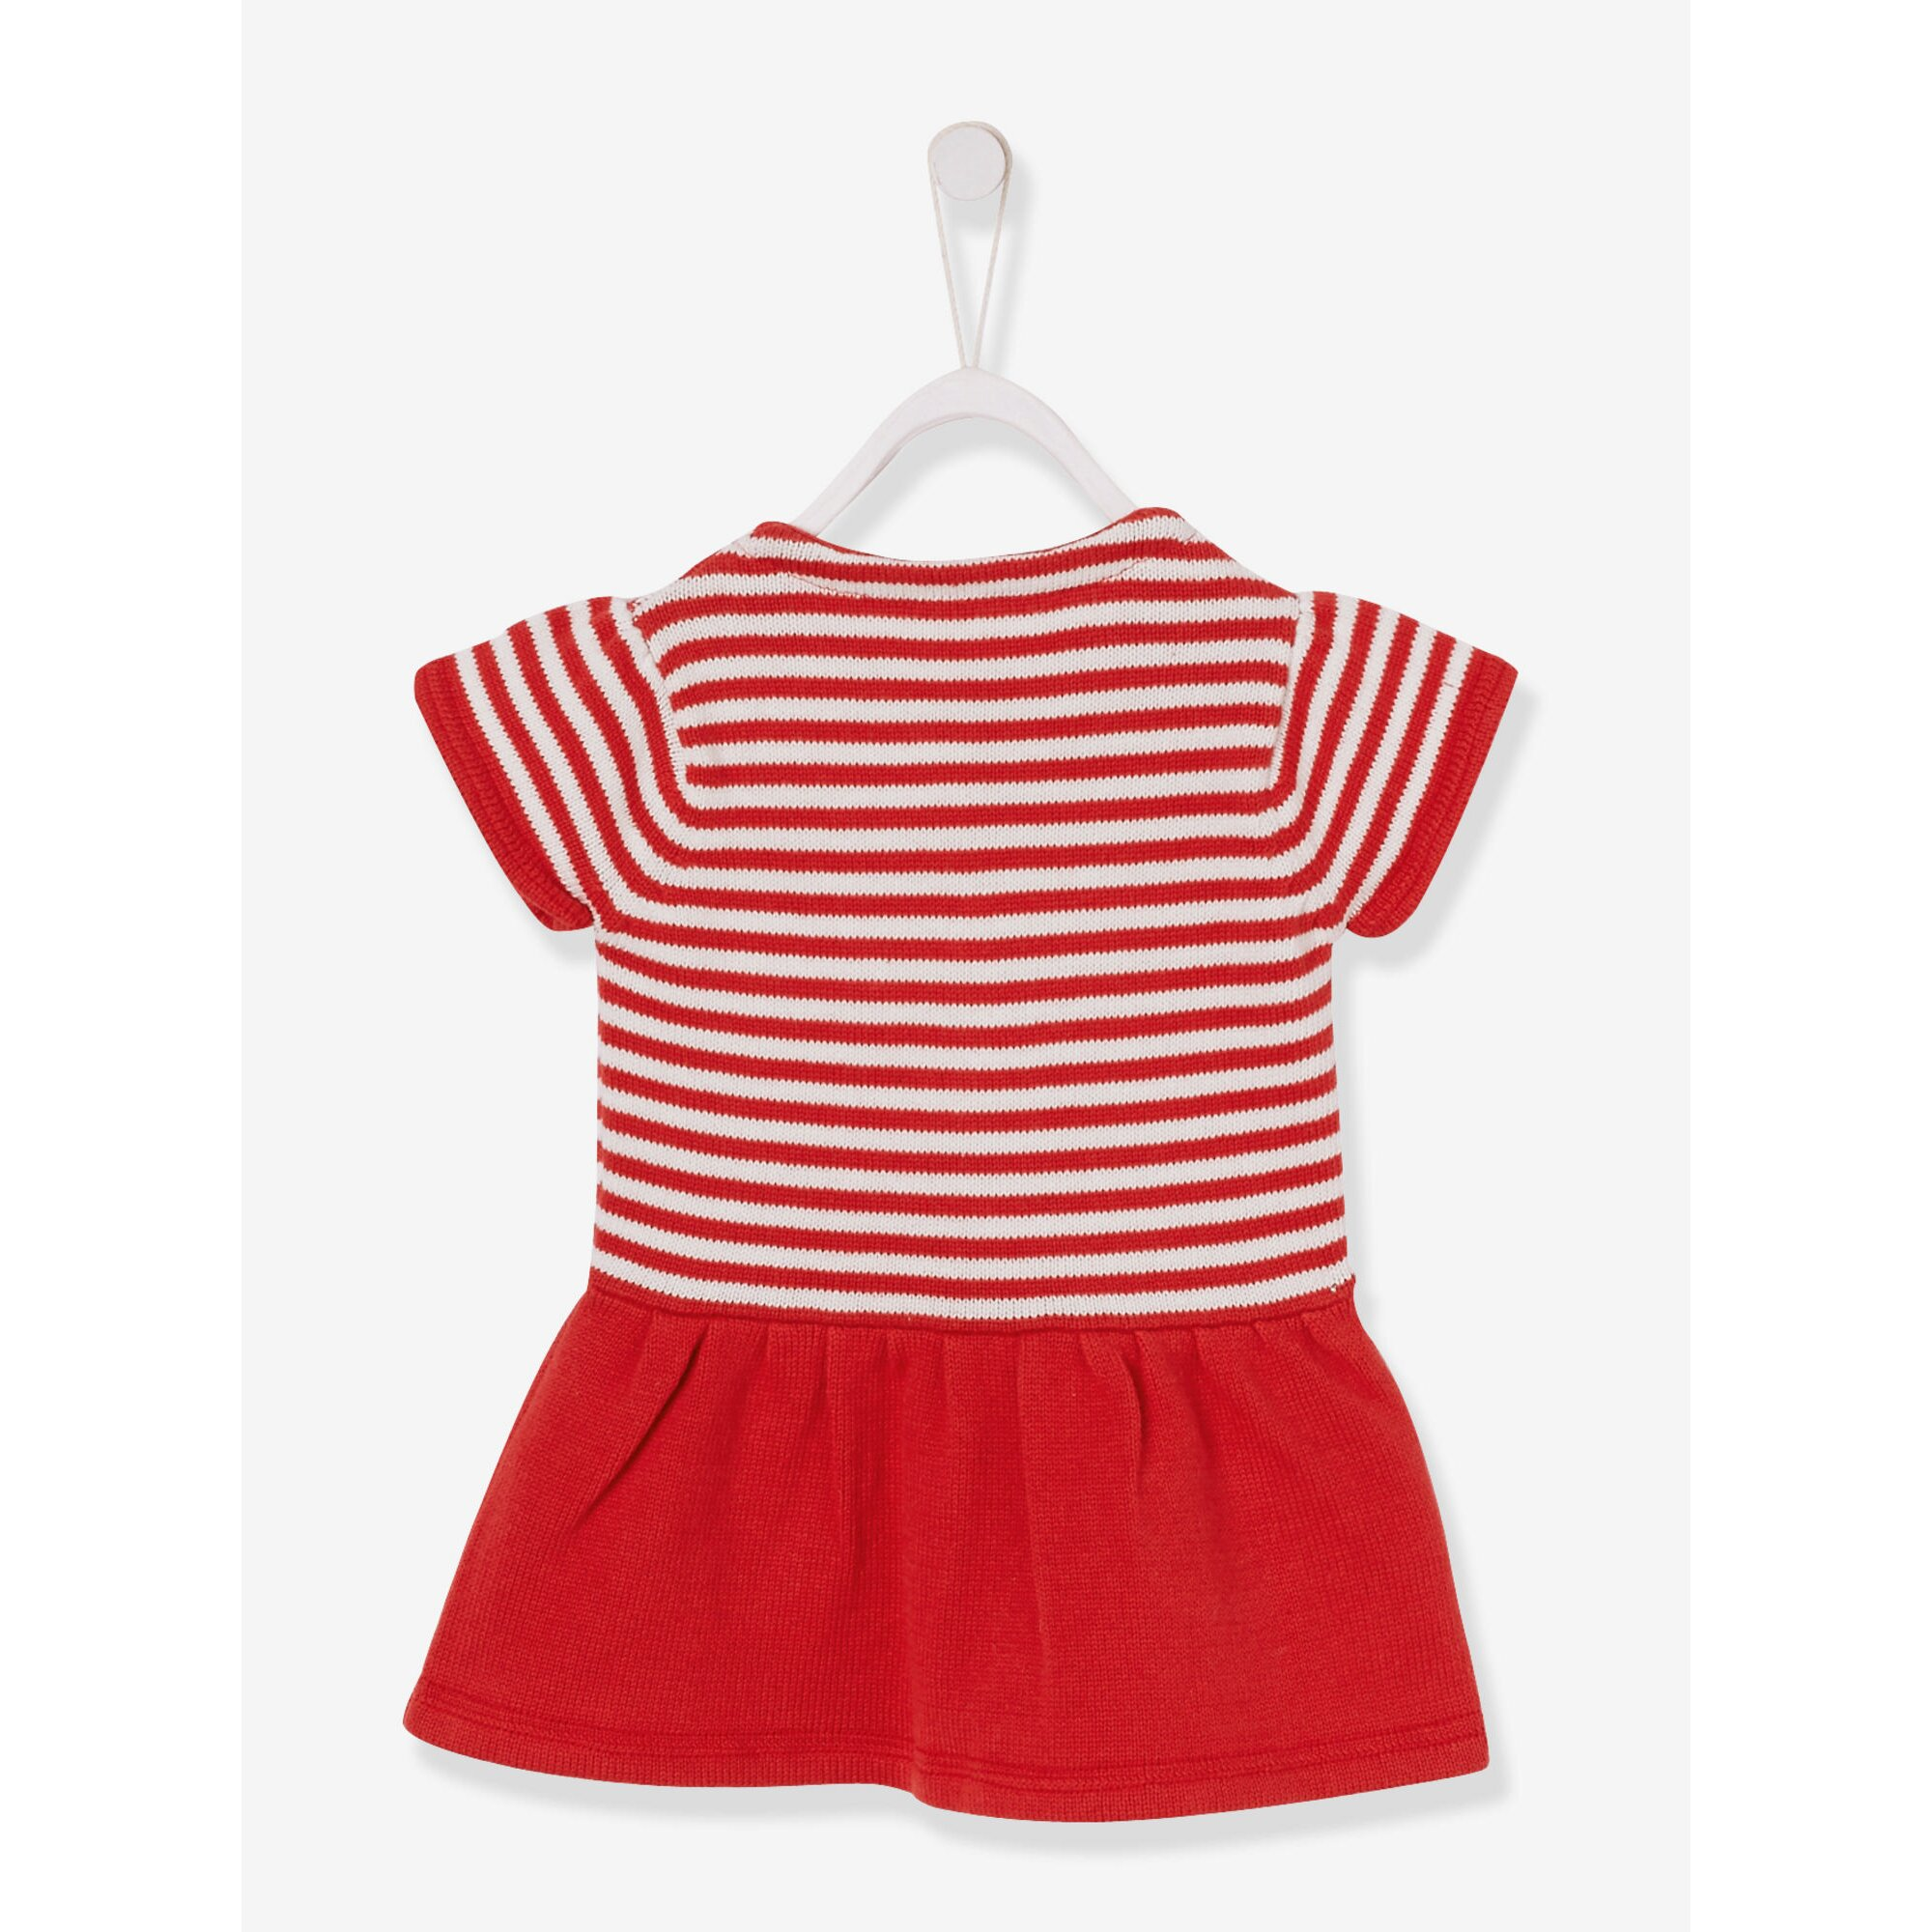 vertbaudet-baby-madchen-strickkleid, 15.99 EUR @ babywalz-de